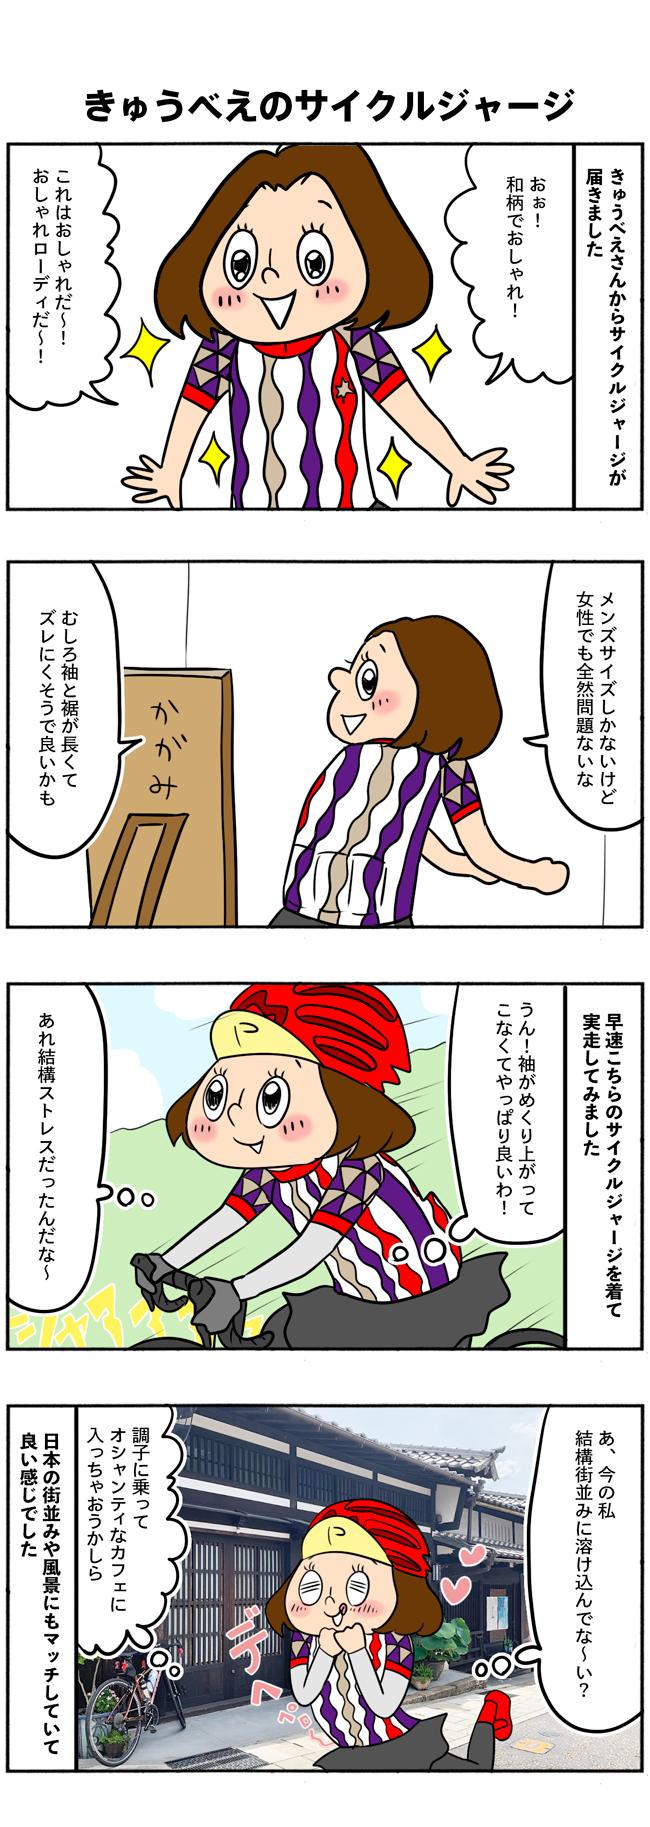 <PR>【四コマ漫画】きゅうべえのサイクルジャージが和柄で超オシャレ!着心地レビュー☆